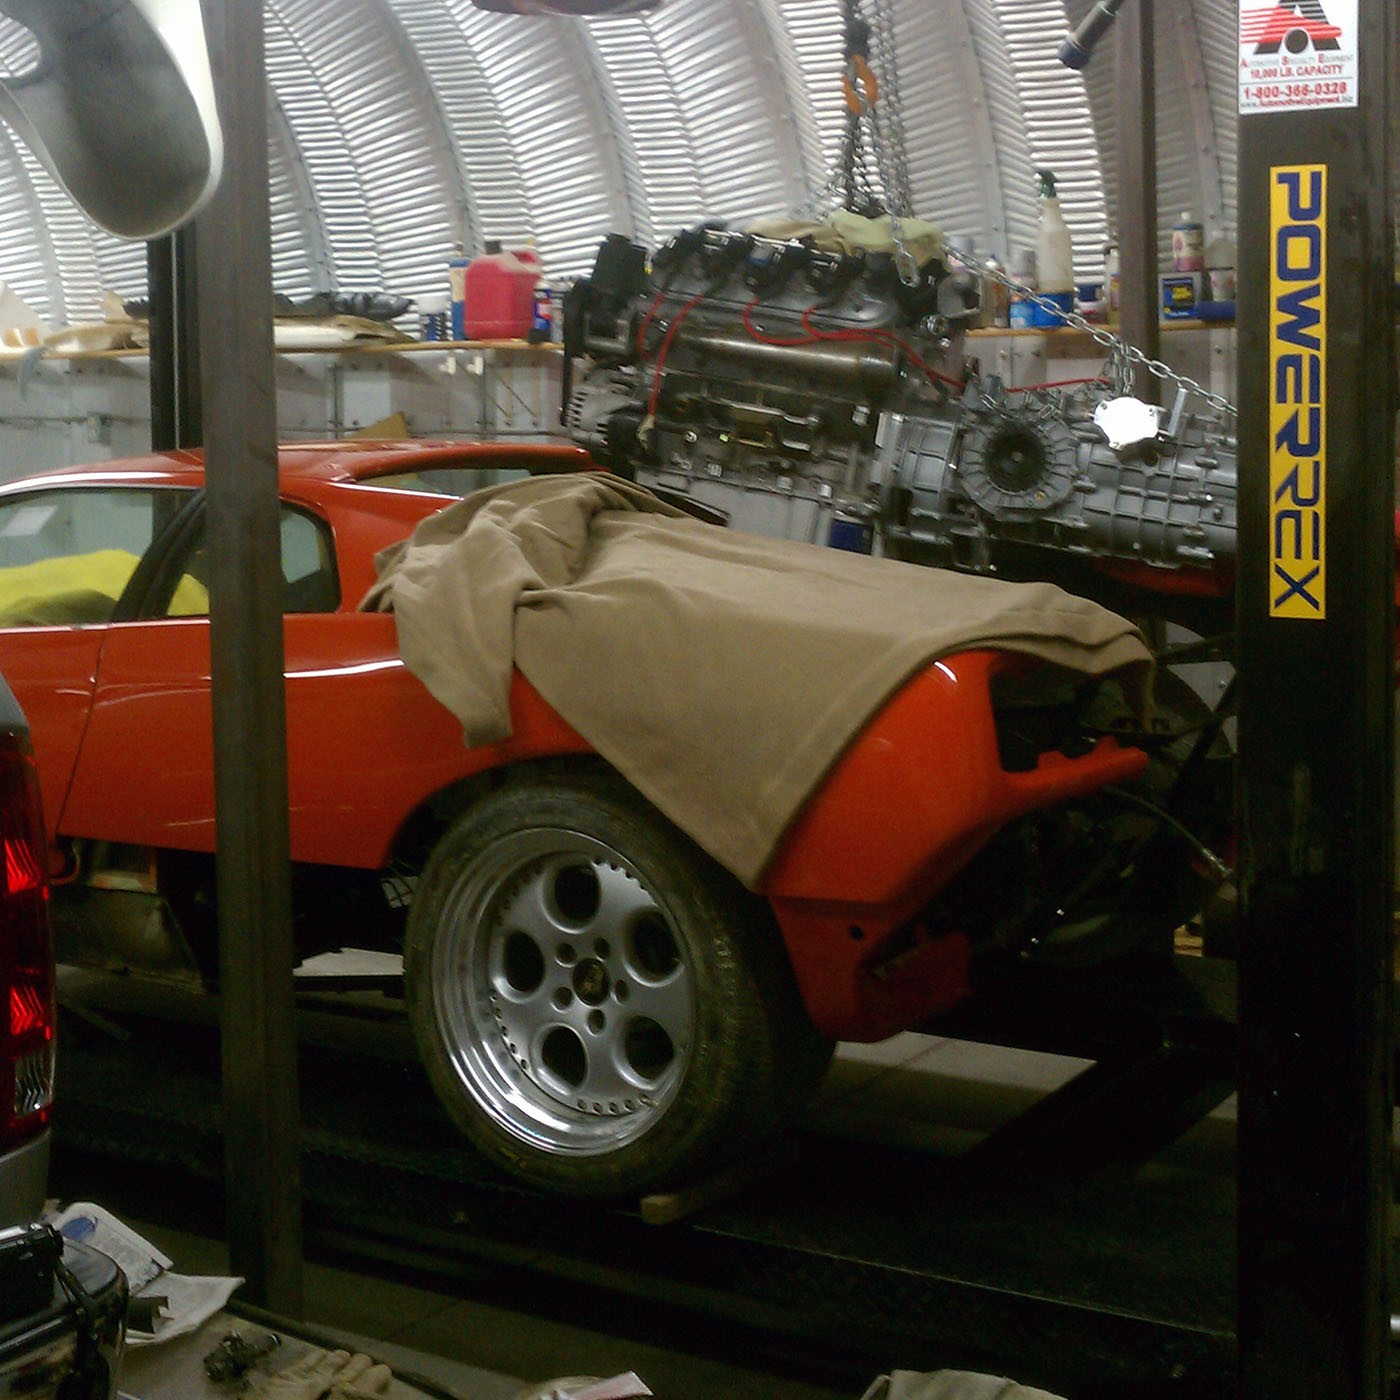 Lamborghini Diablo With Ls3 V8 Engine Swap Has 550 Hp